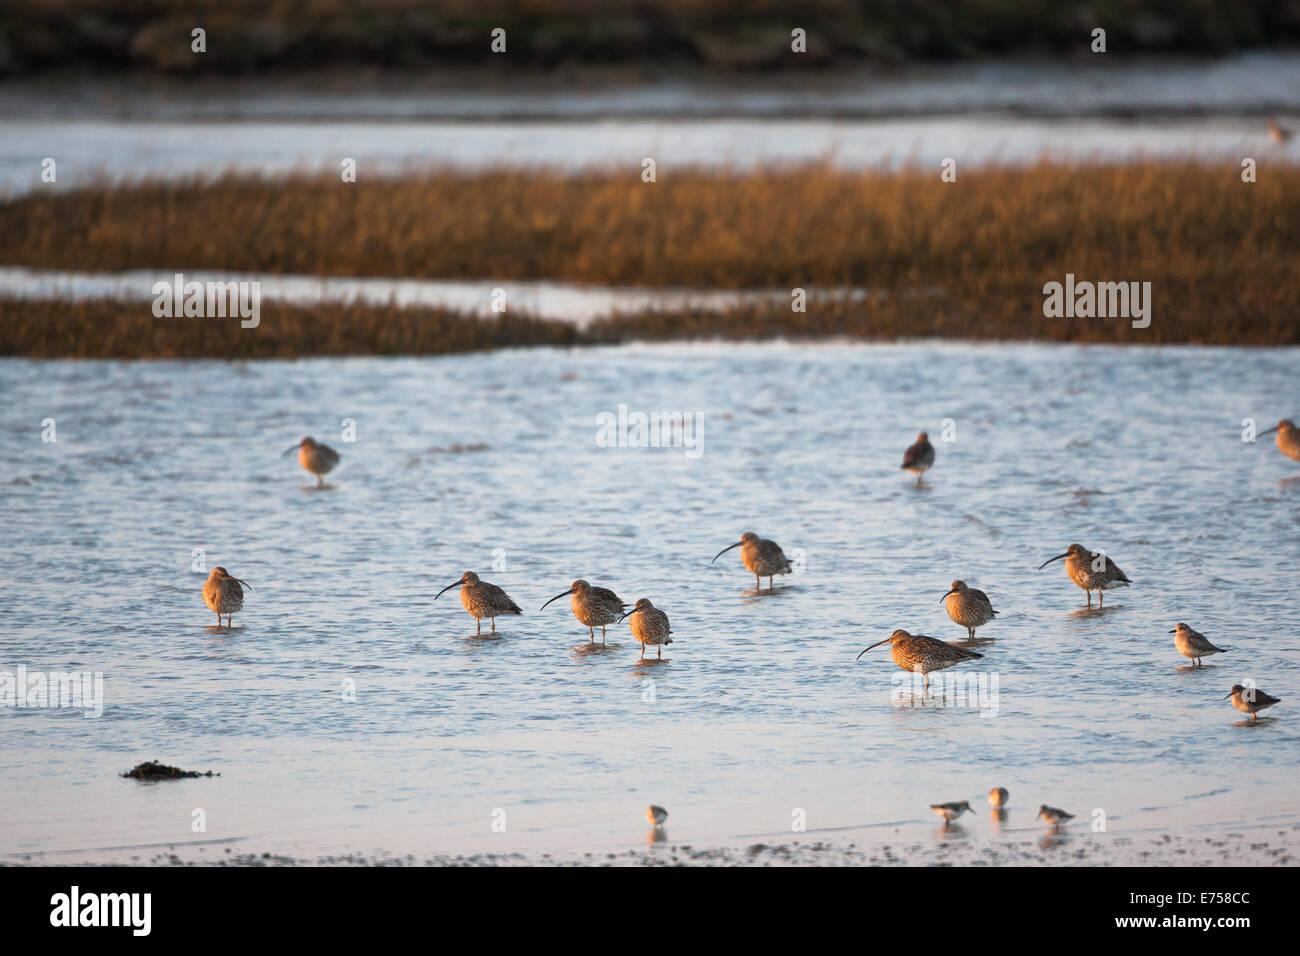 Coastal birds feeding on the beach - Stock Image